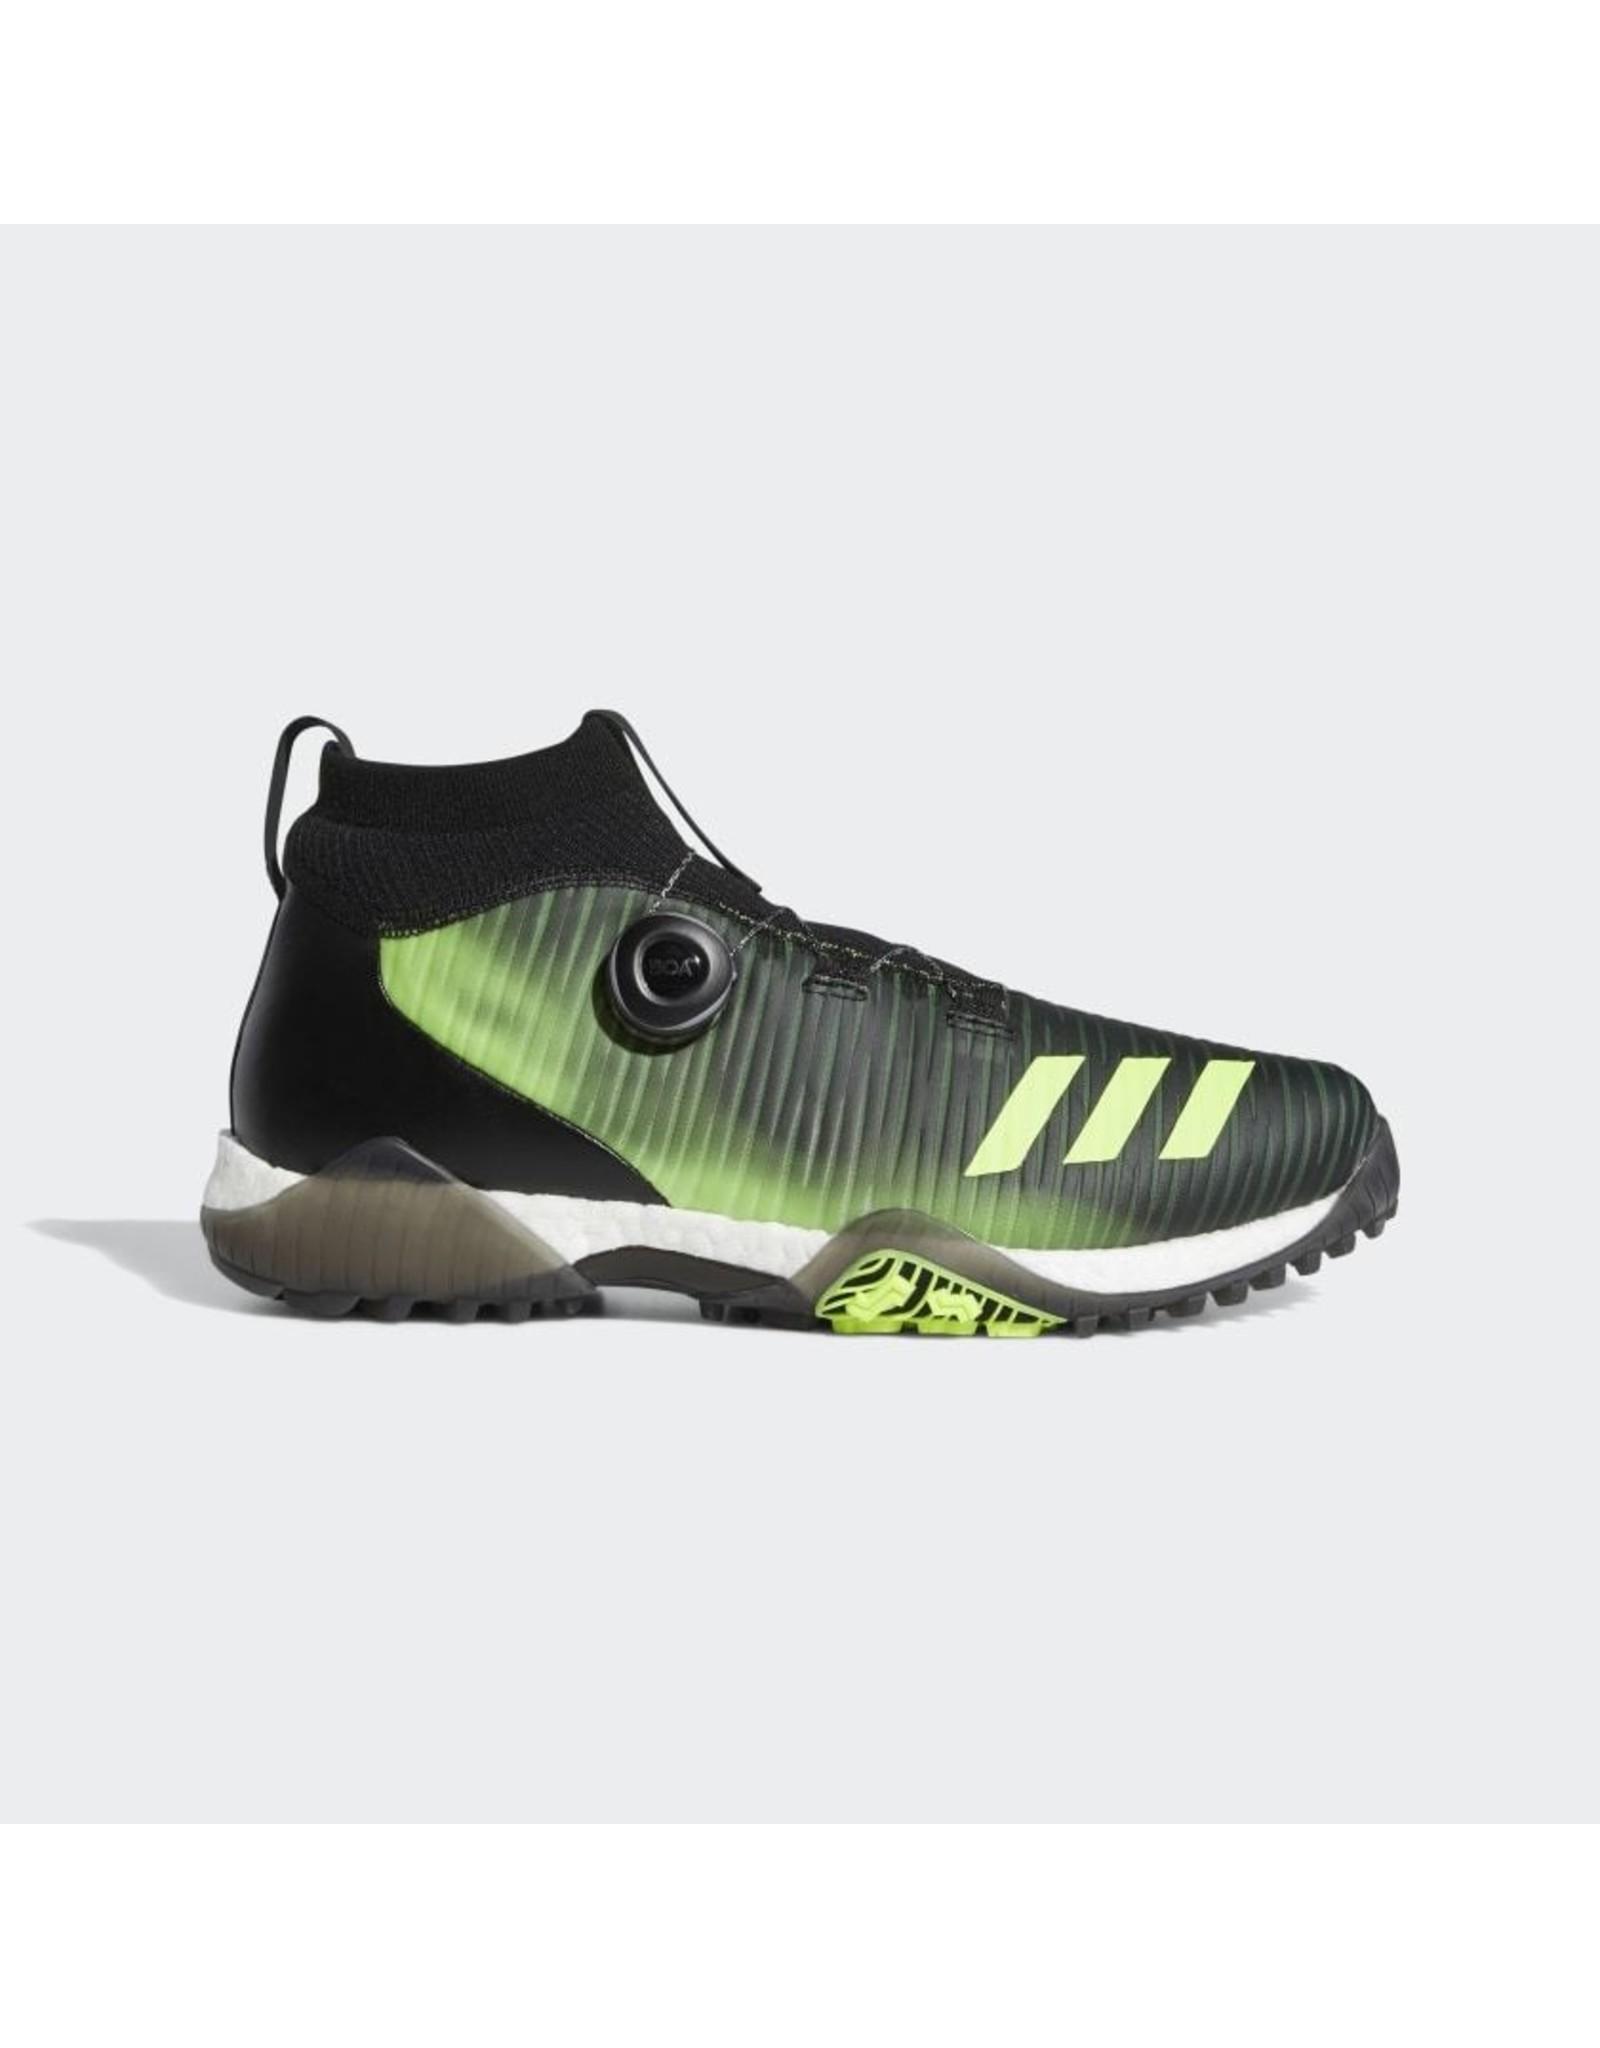 Adidas Adidas CodeChaos BOA Black/Neon